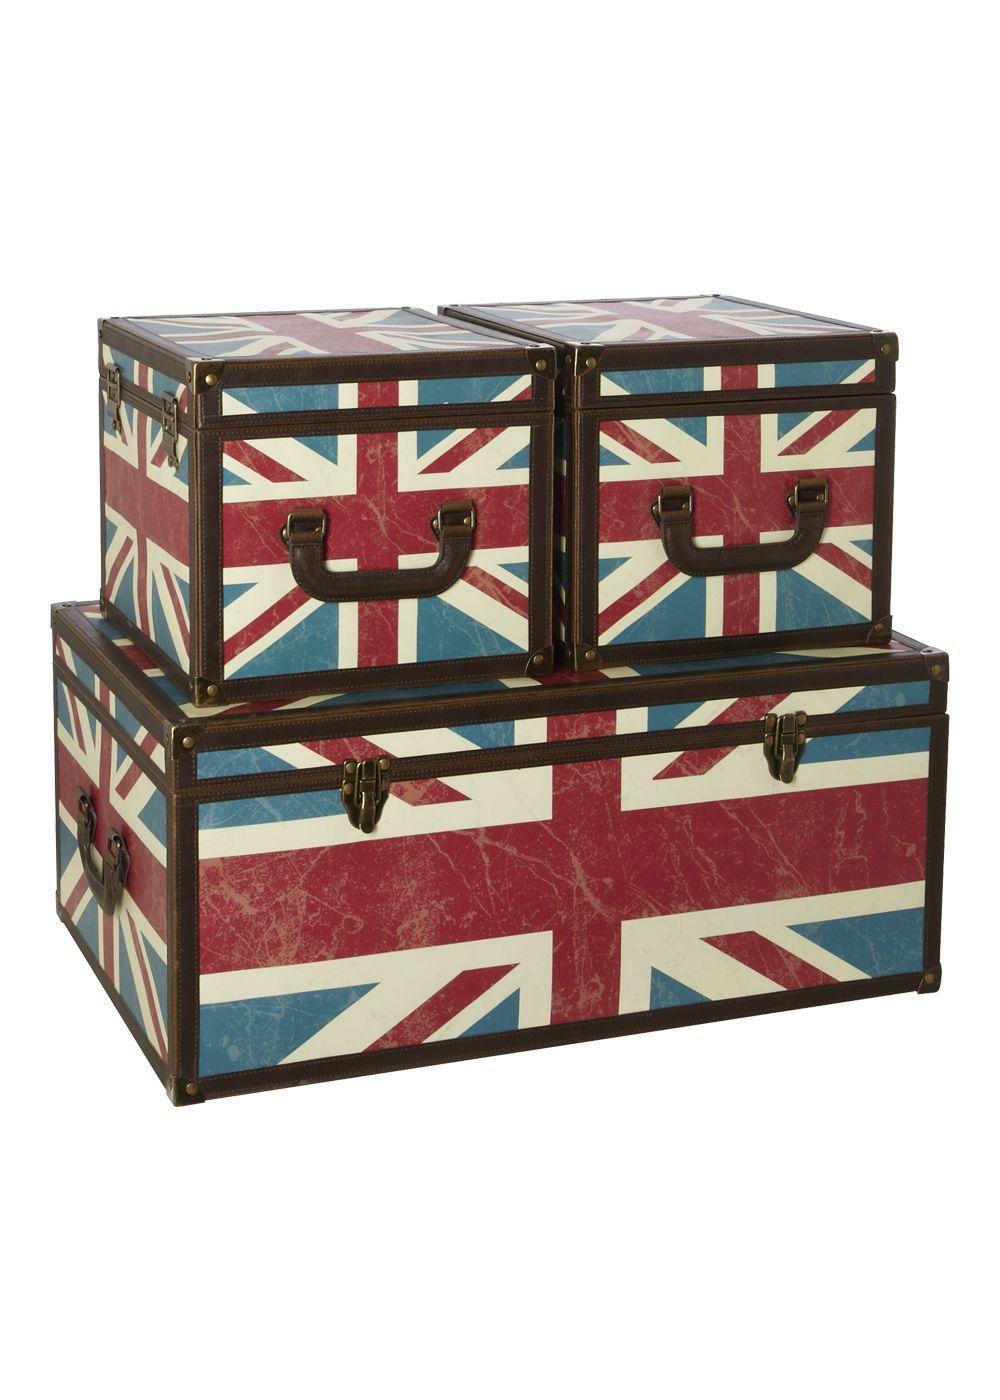 Matalan - Union Jack Set Of 3 Trunks   London living Lifestyle ...